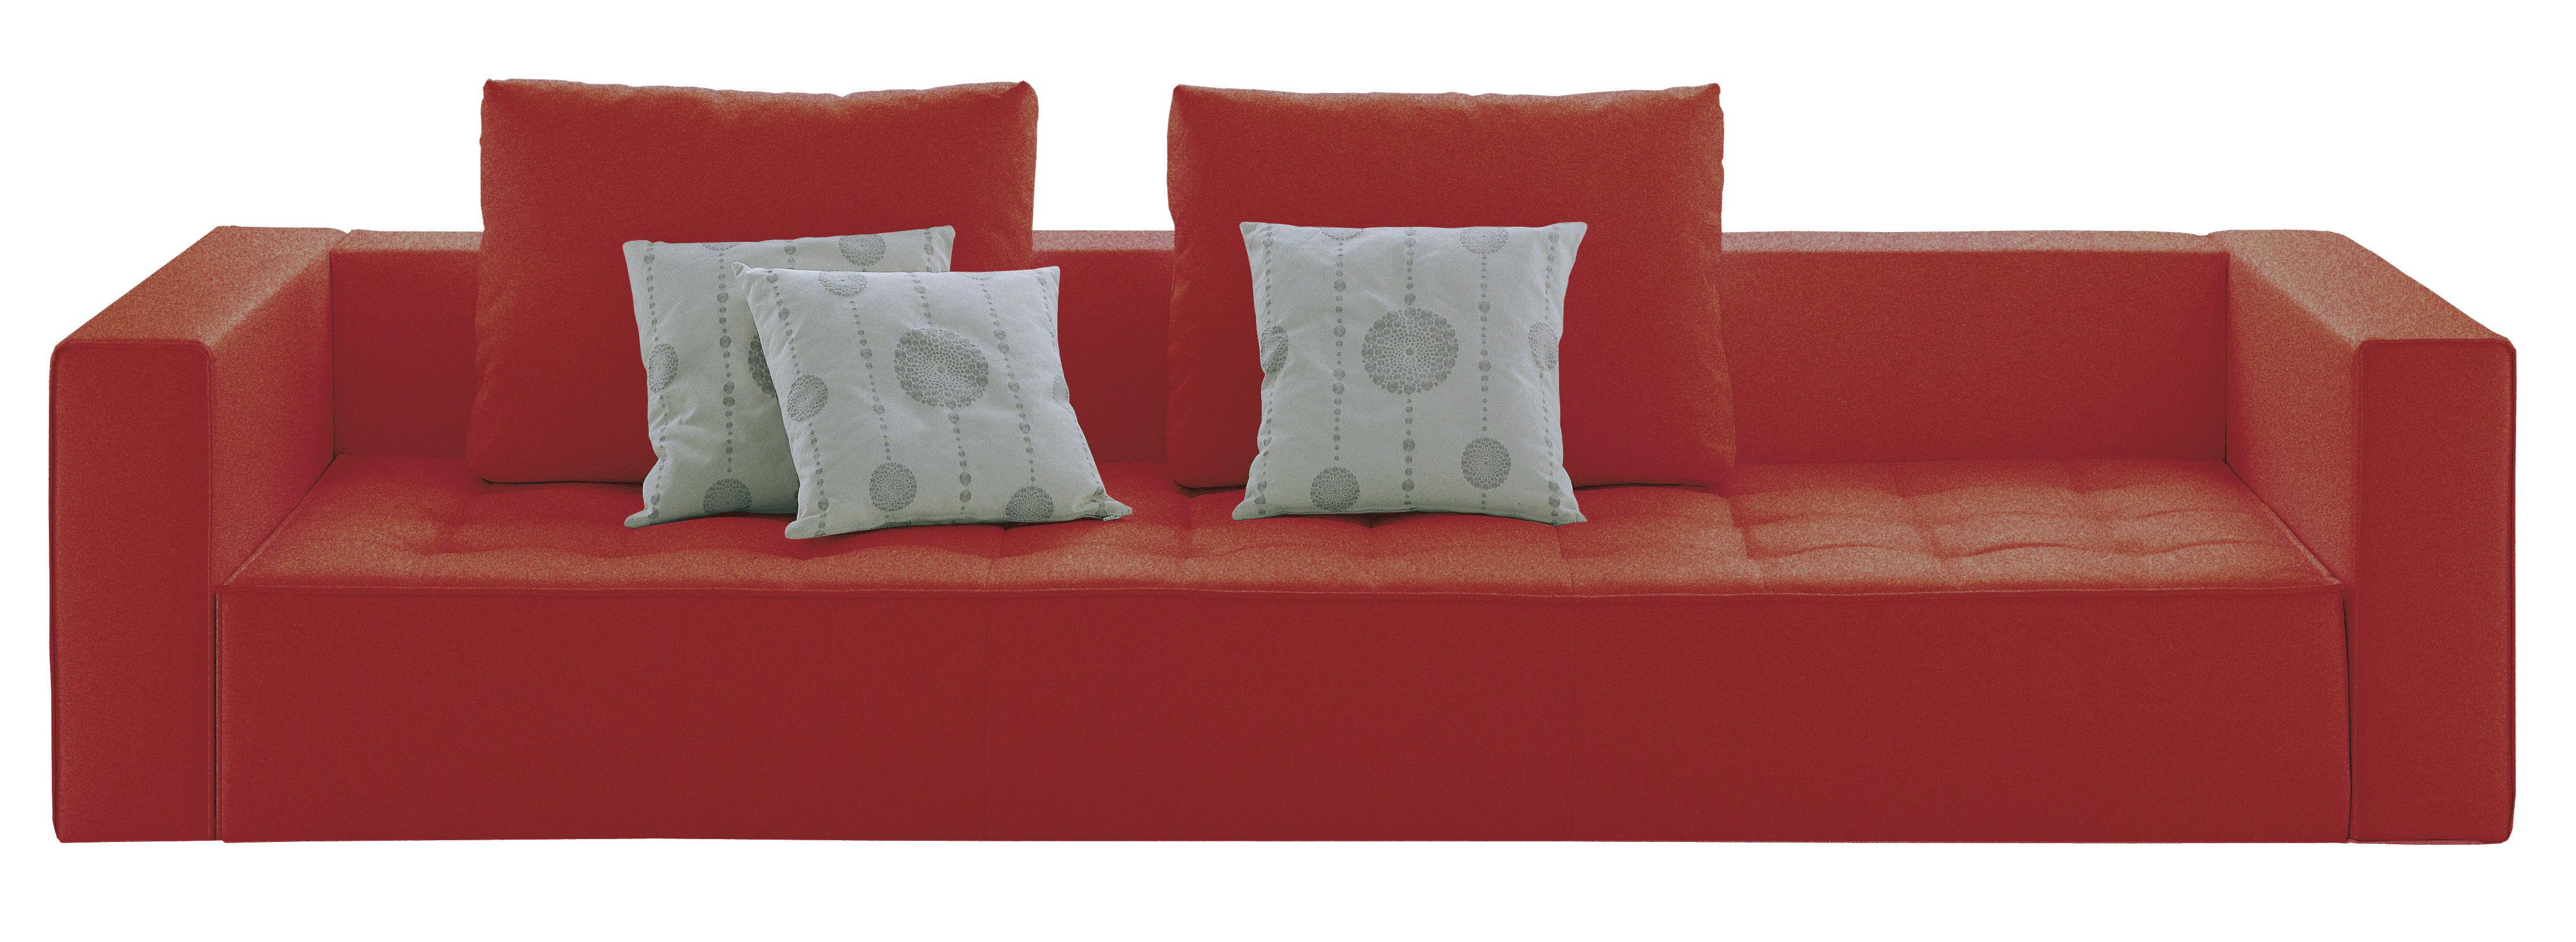 canap droit kilt tissu 3 places l 234 cm tissu. Black Bedroom Furniture Sets. Home Design Ideas